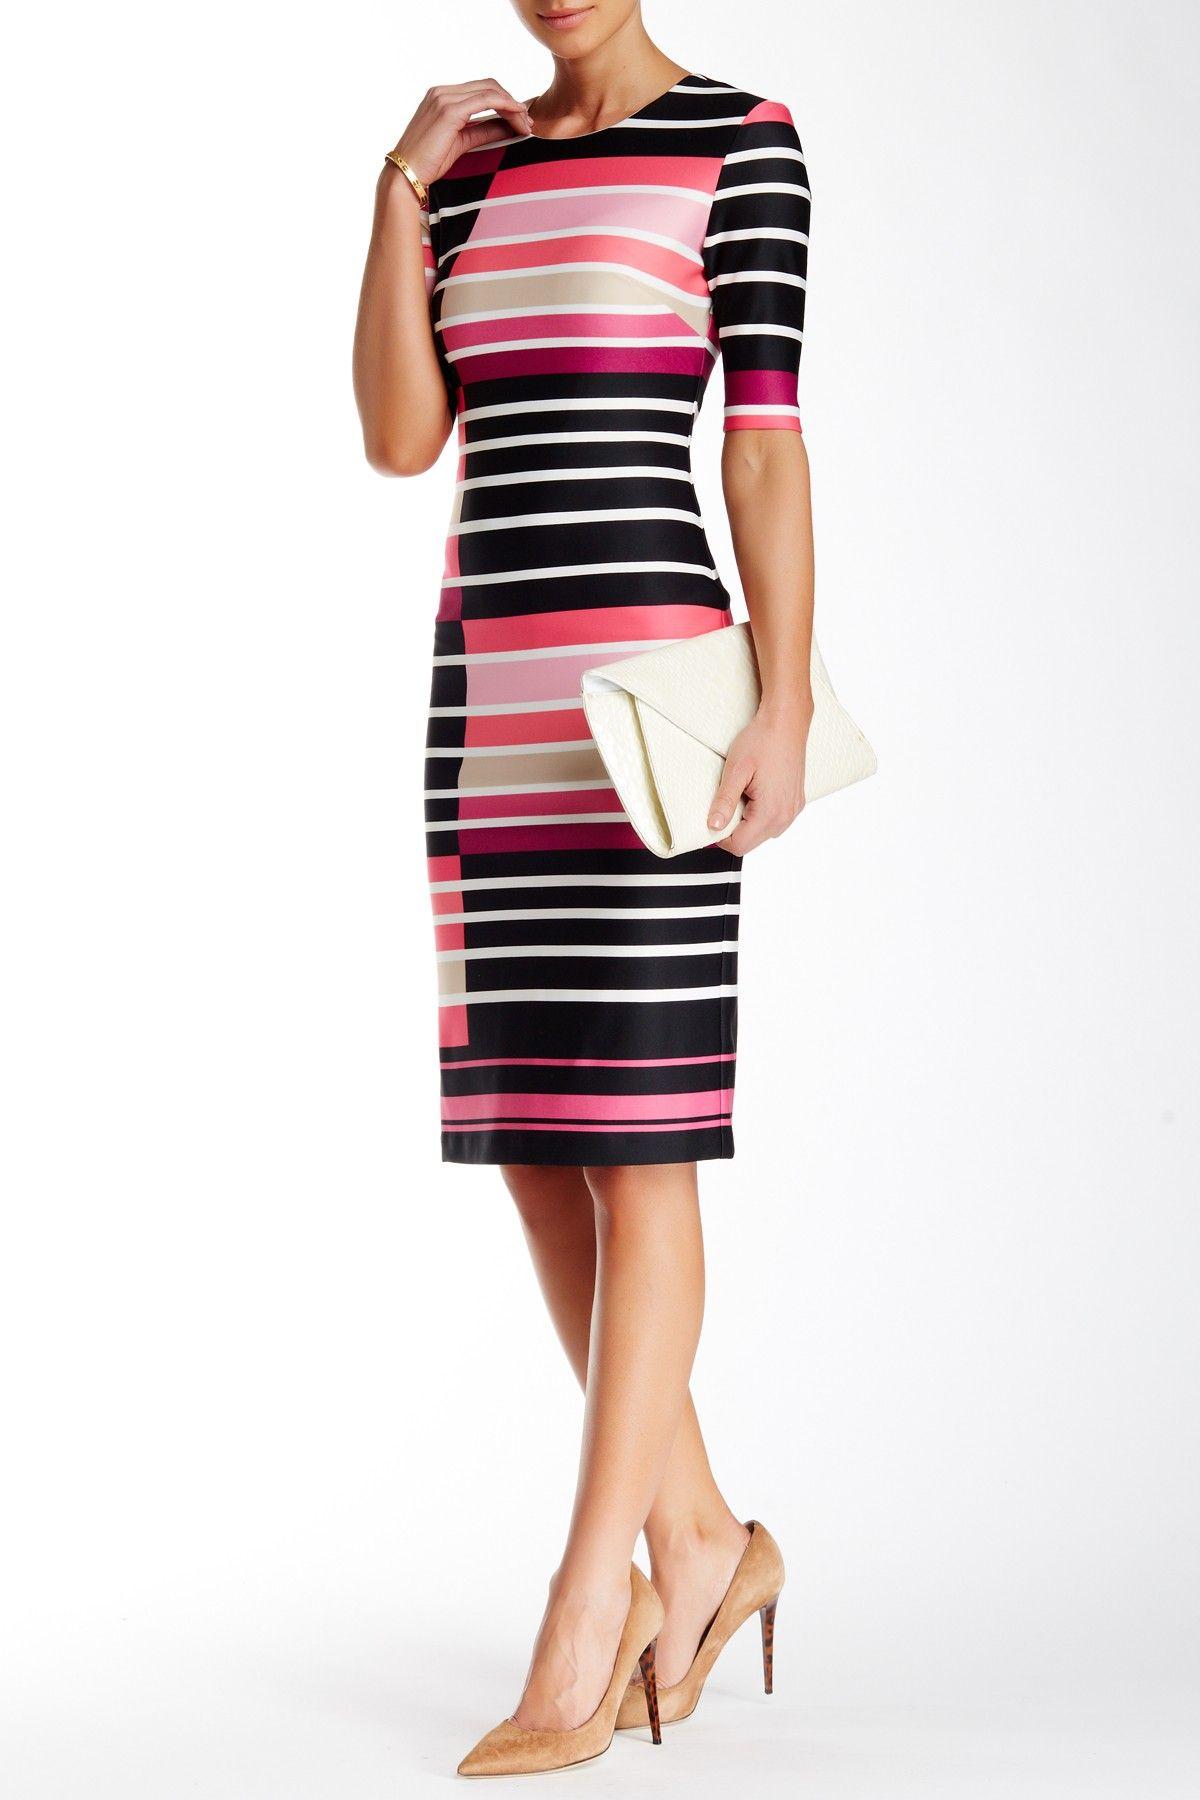 Eliza j striped scuba midi dress was ium too sexy for